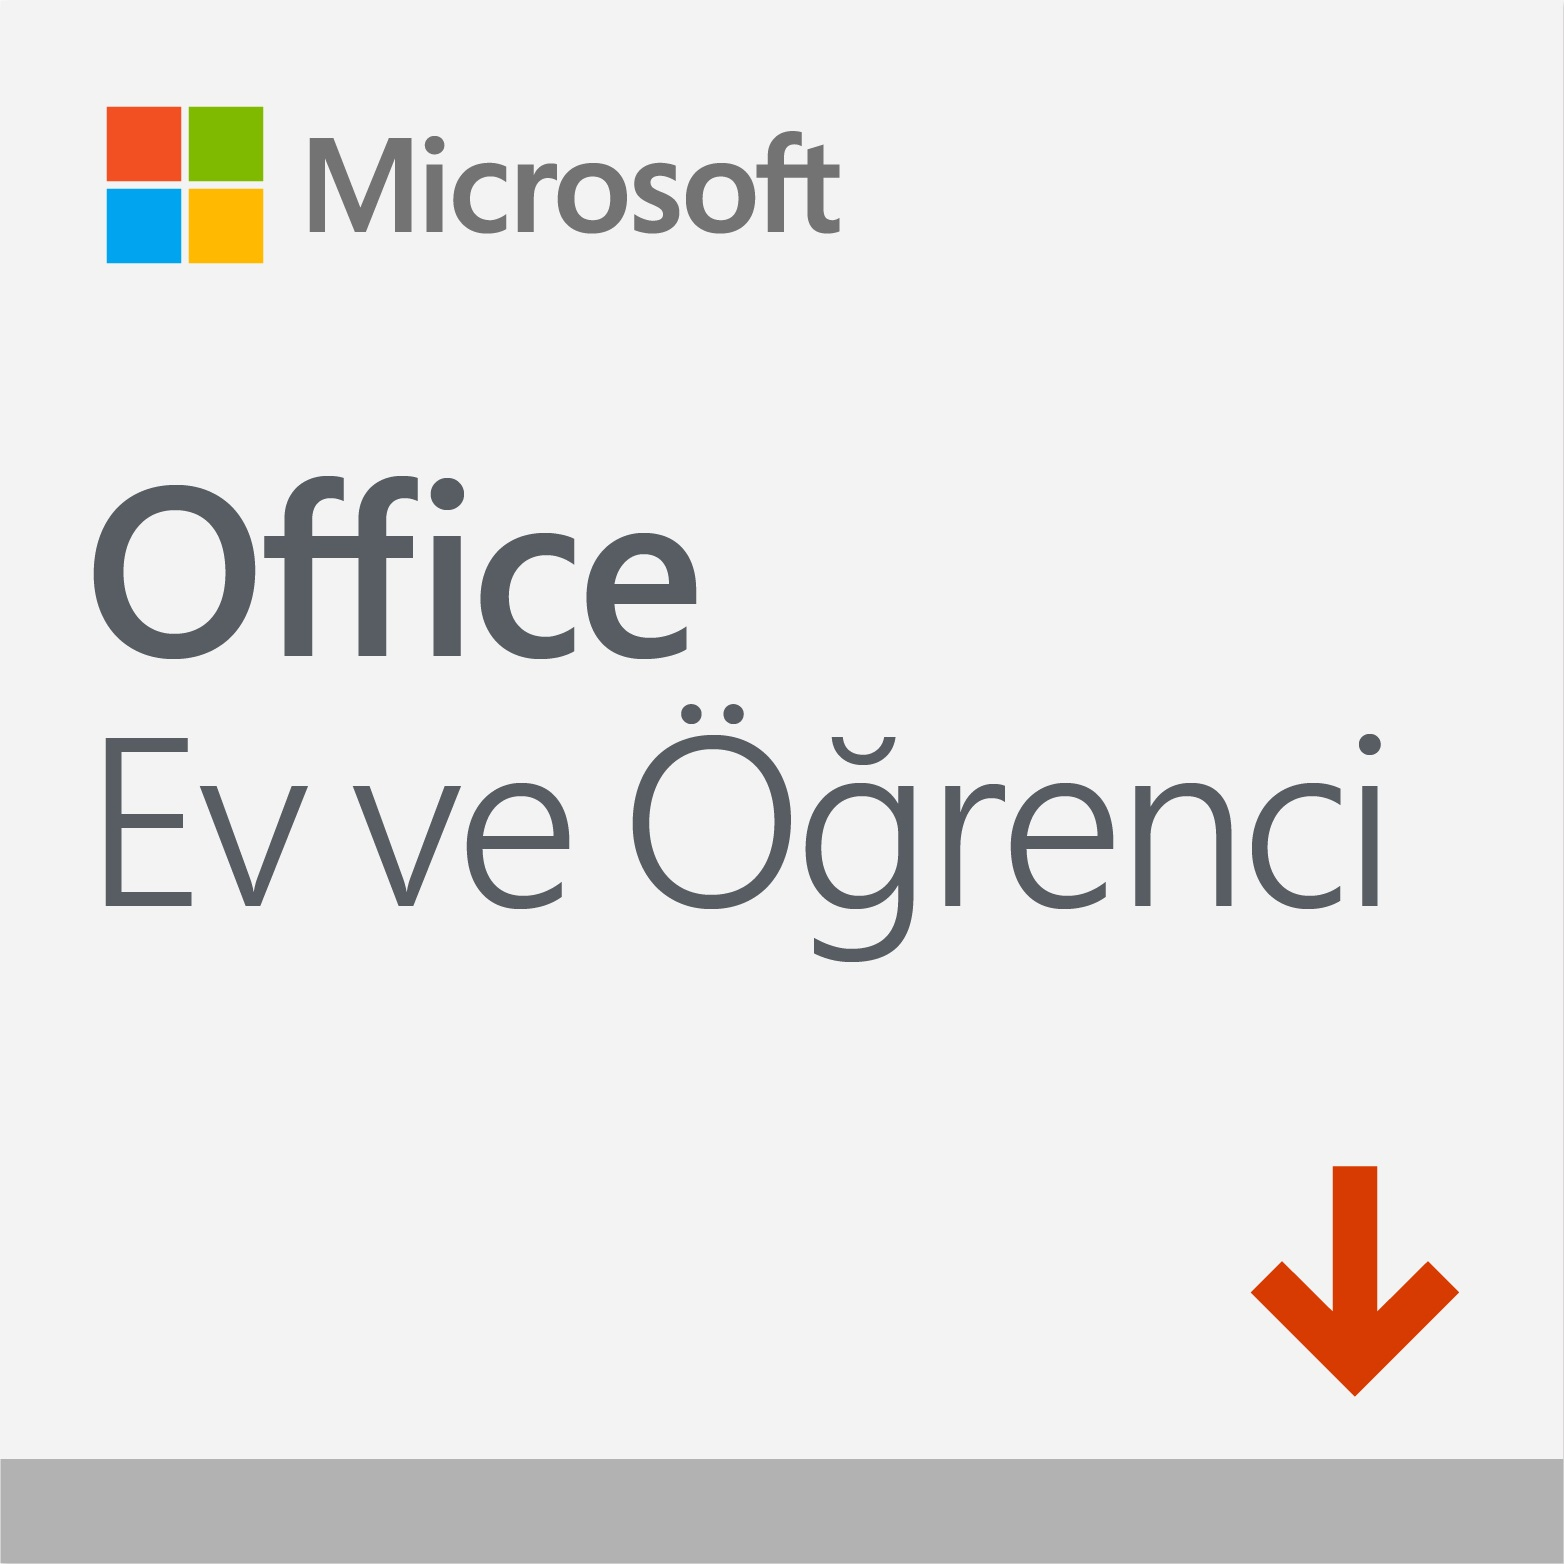 Microsoft Ev ve Öğrenci 2019-Elkt. Lisans